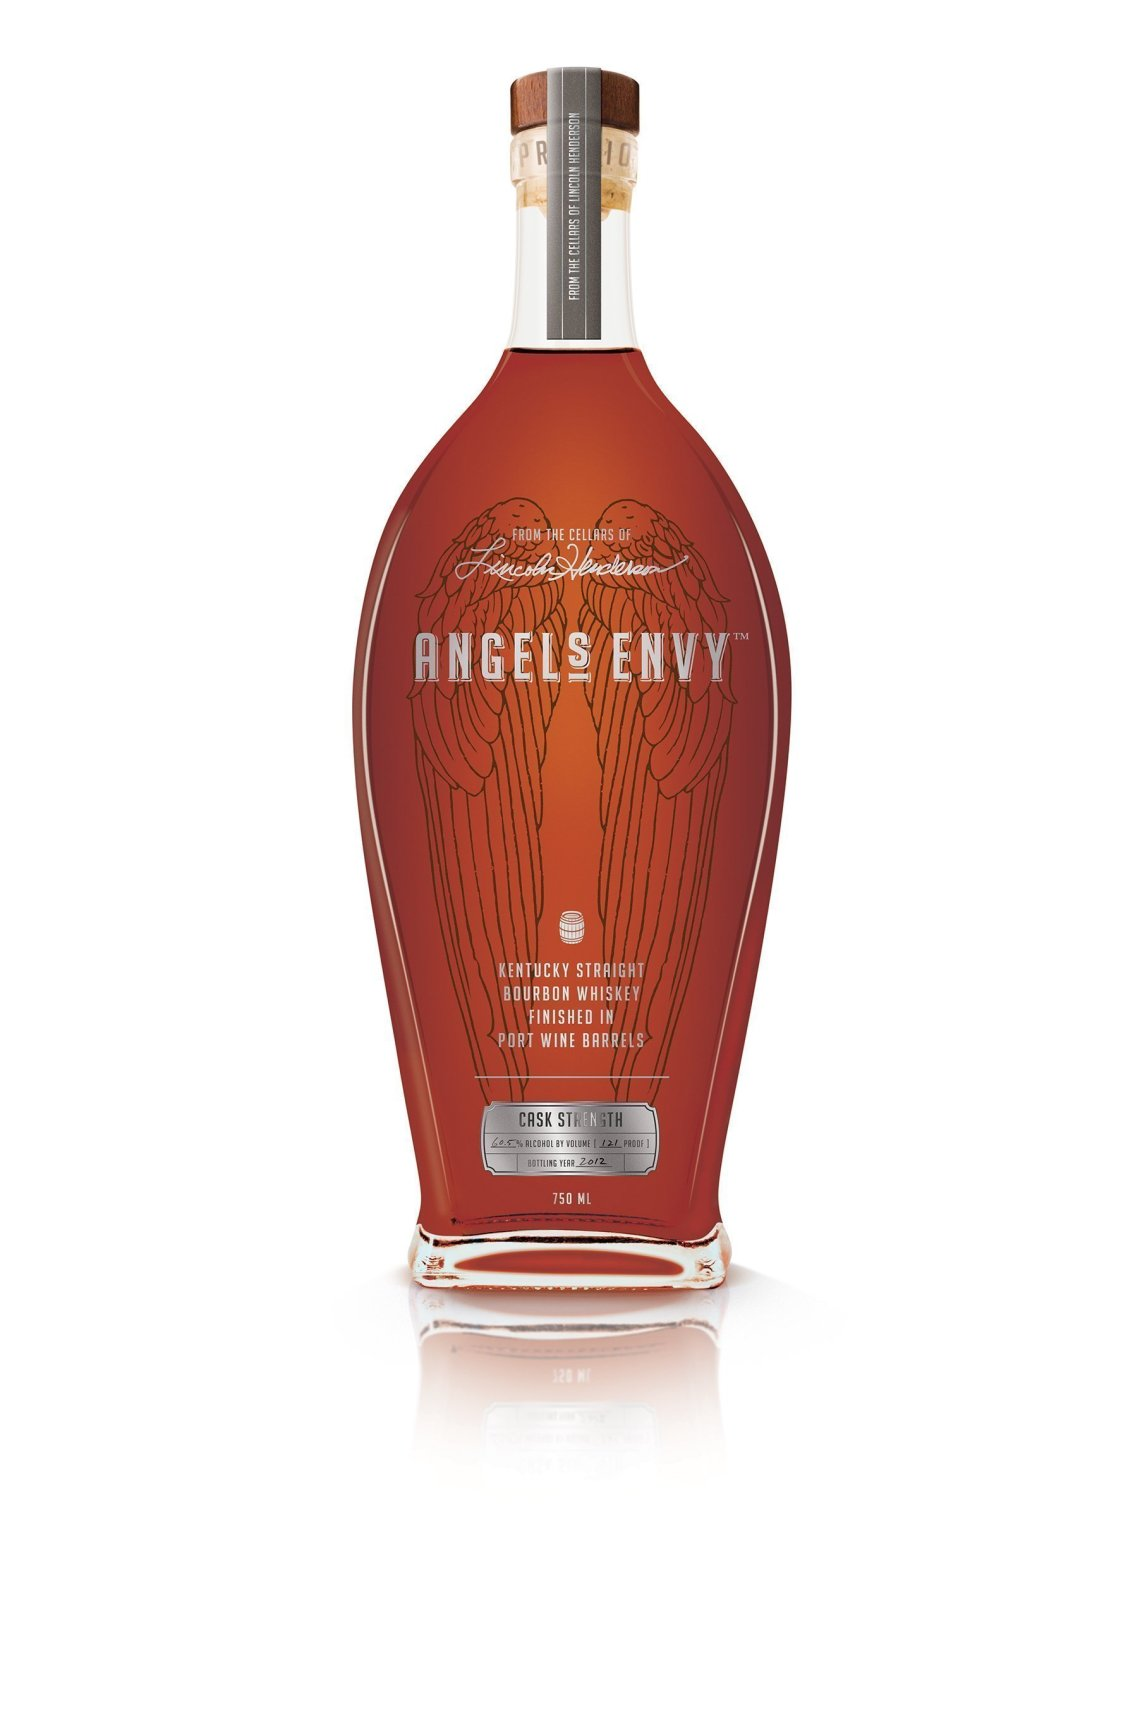 Angel's Envy Cask Strength Bourbon - Limited Edition (2013)